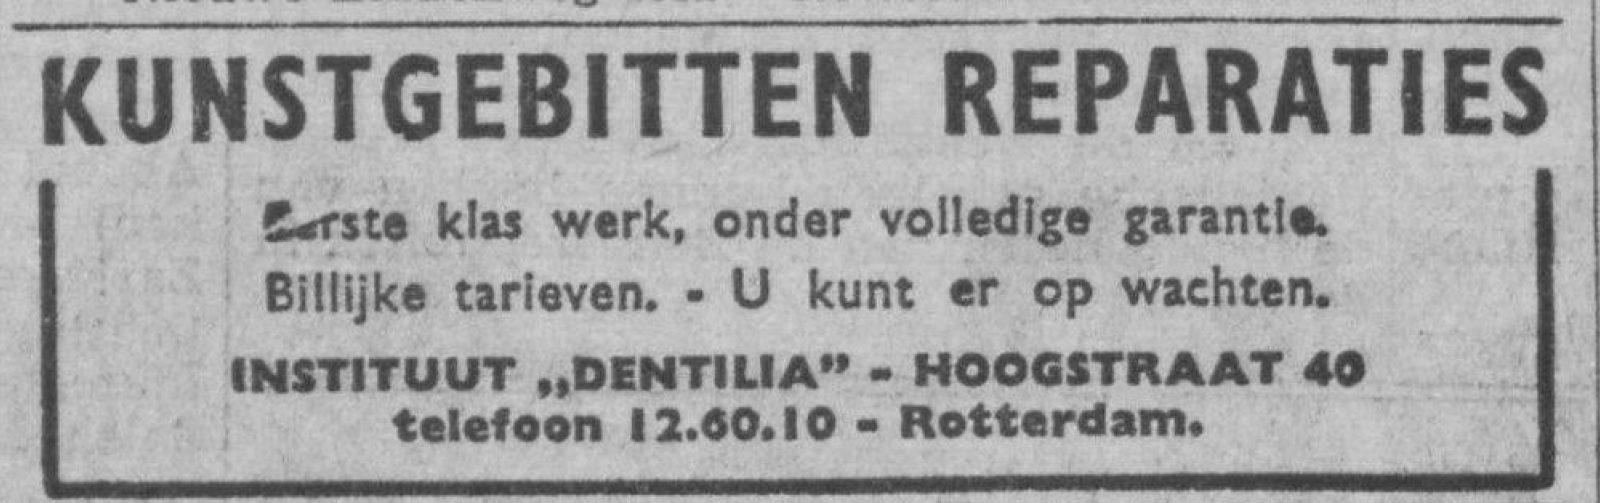 Nieuwe Schiedamsche Courant 19590207 dentilia